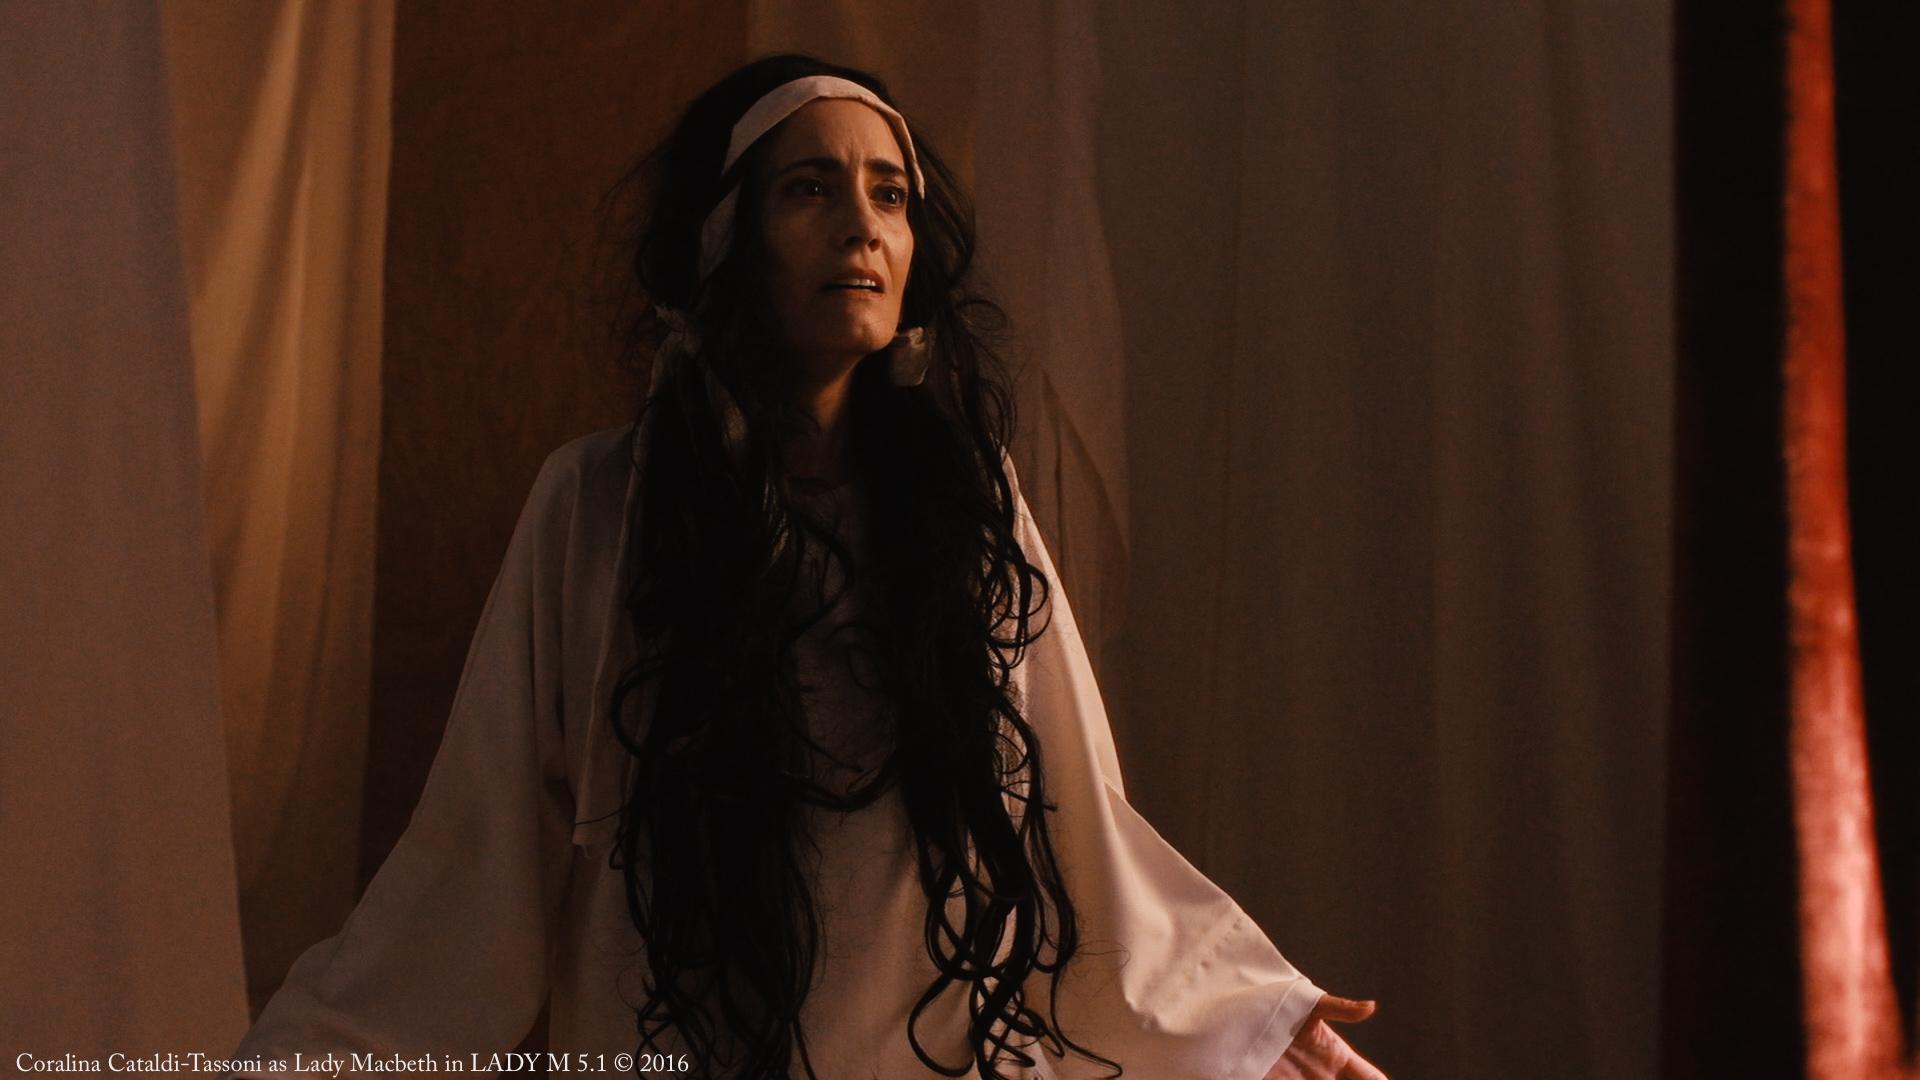 b. Coralina Cataldi-Tassoni as Lady Macbeth in Lady M 5.1 All rights reserved 32.jpg